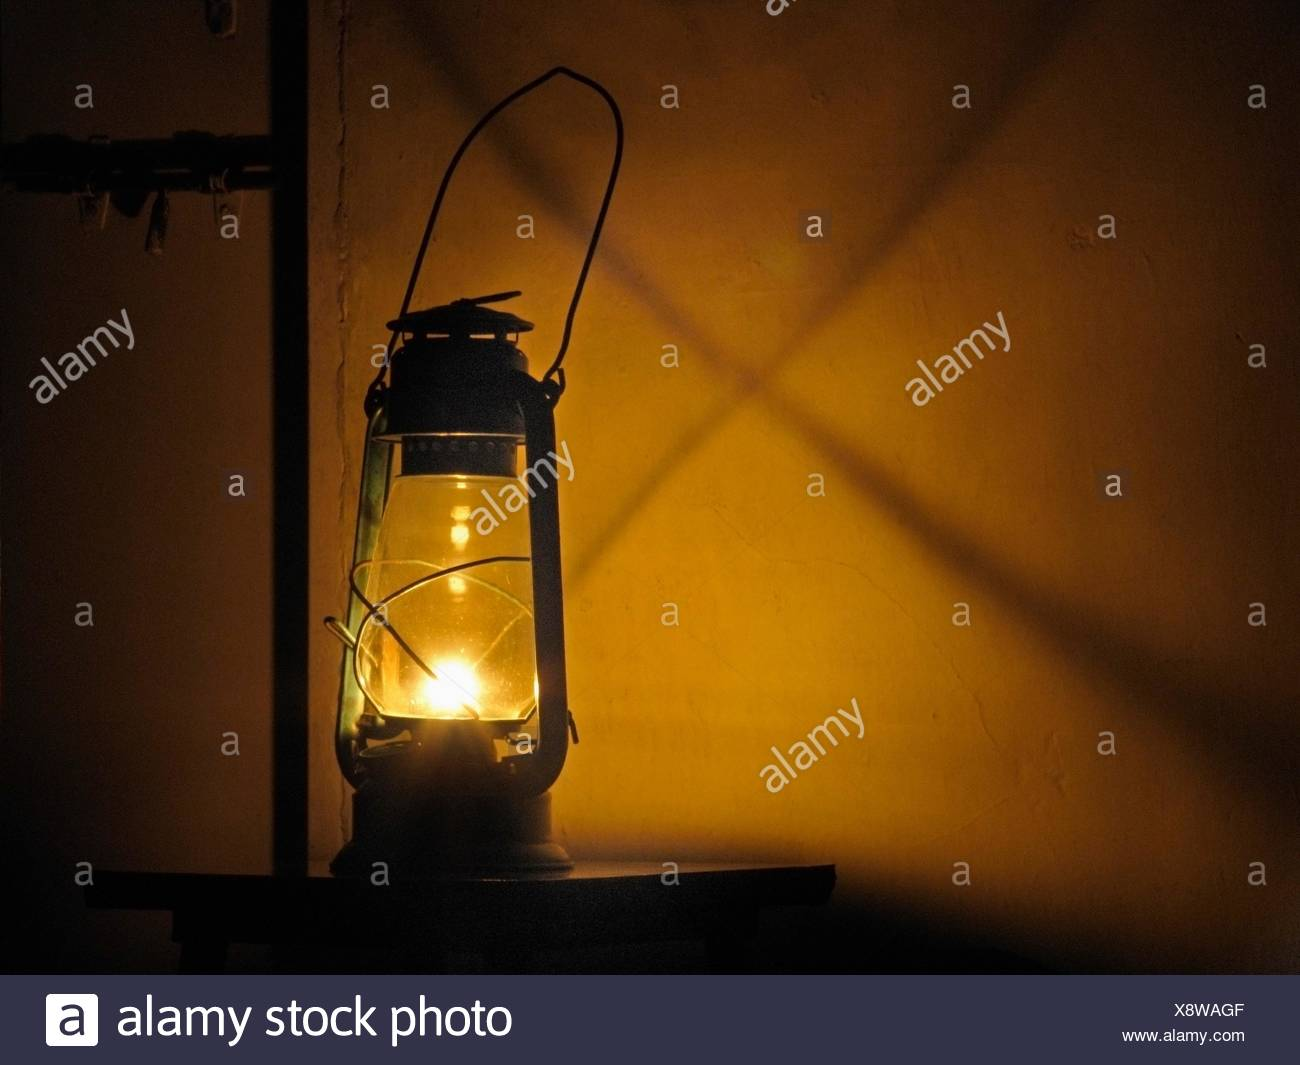 Lantern in darkness with shadow on wall  Mulshi, Pune, Maharashtra, India - Stock Image